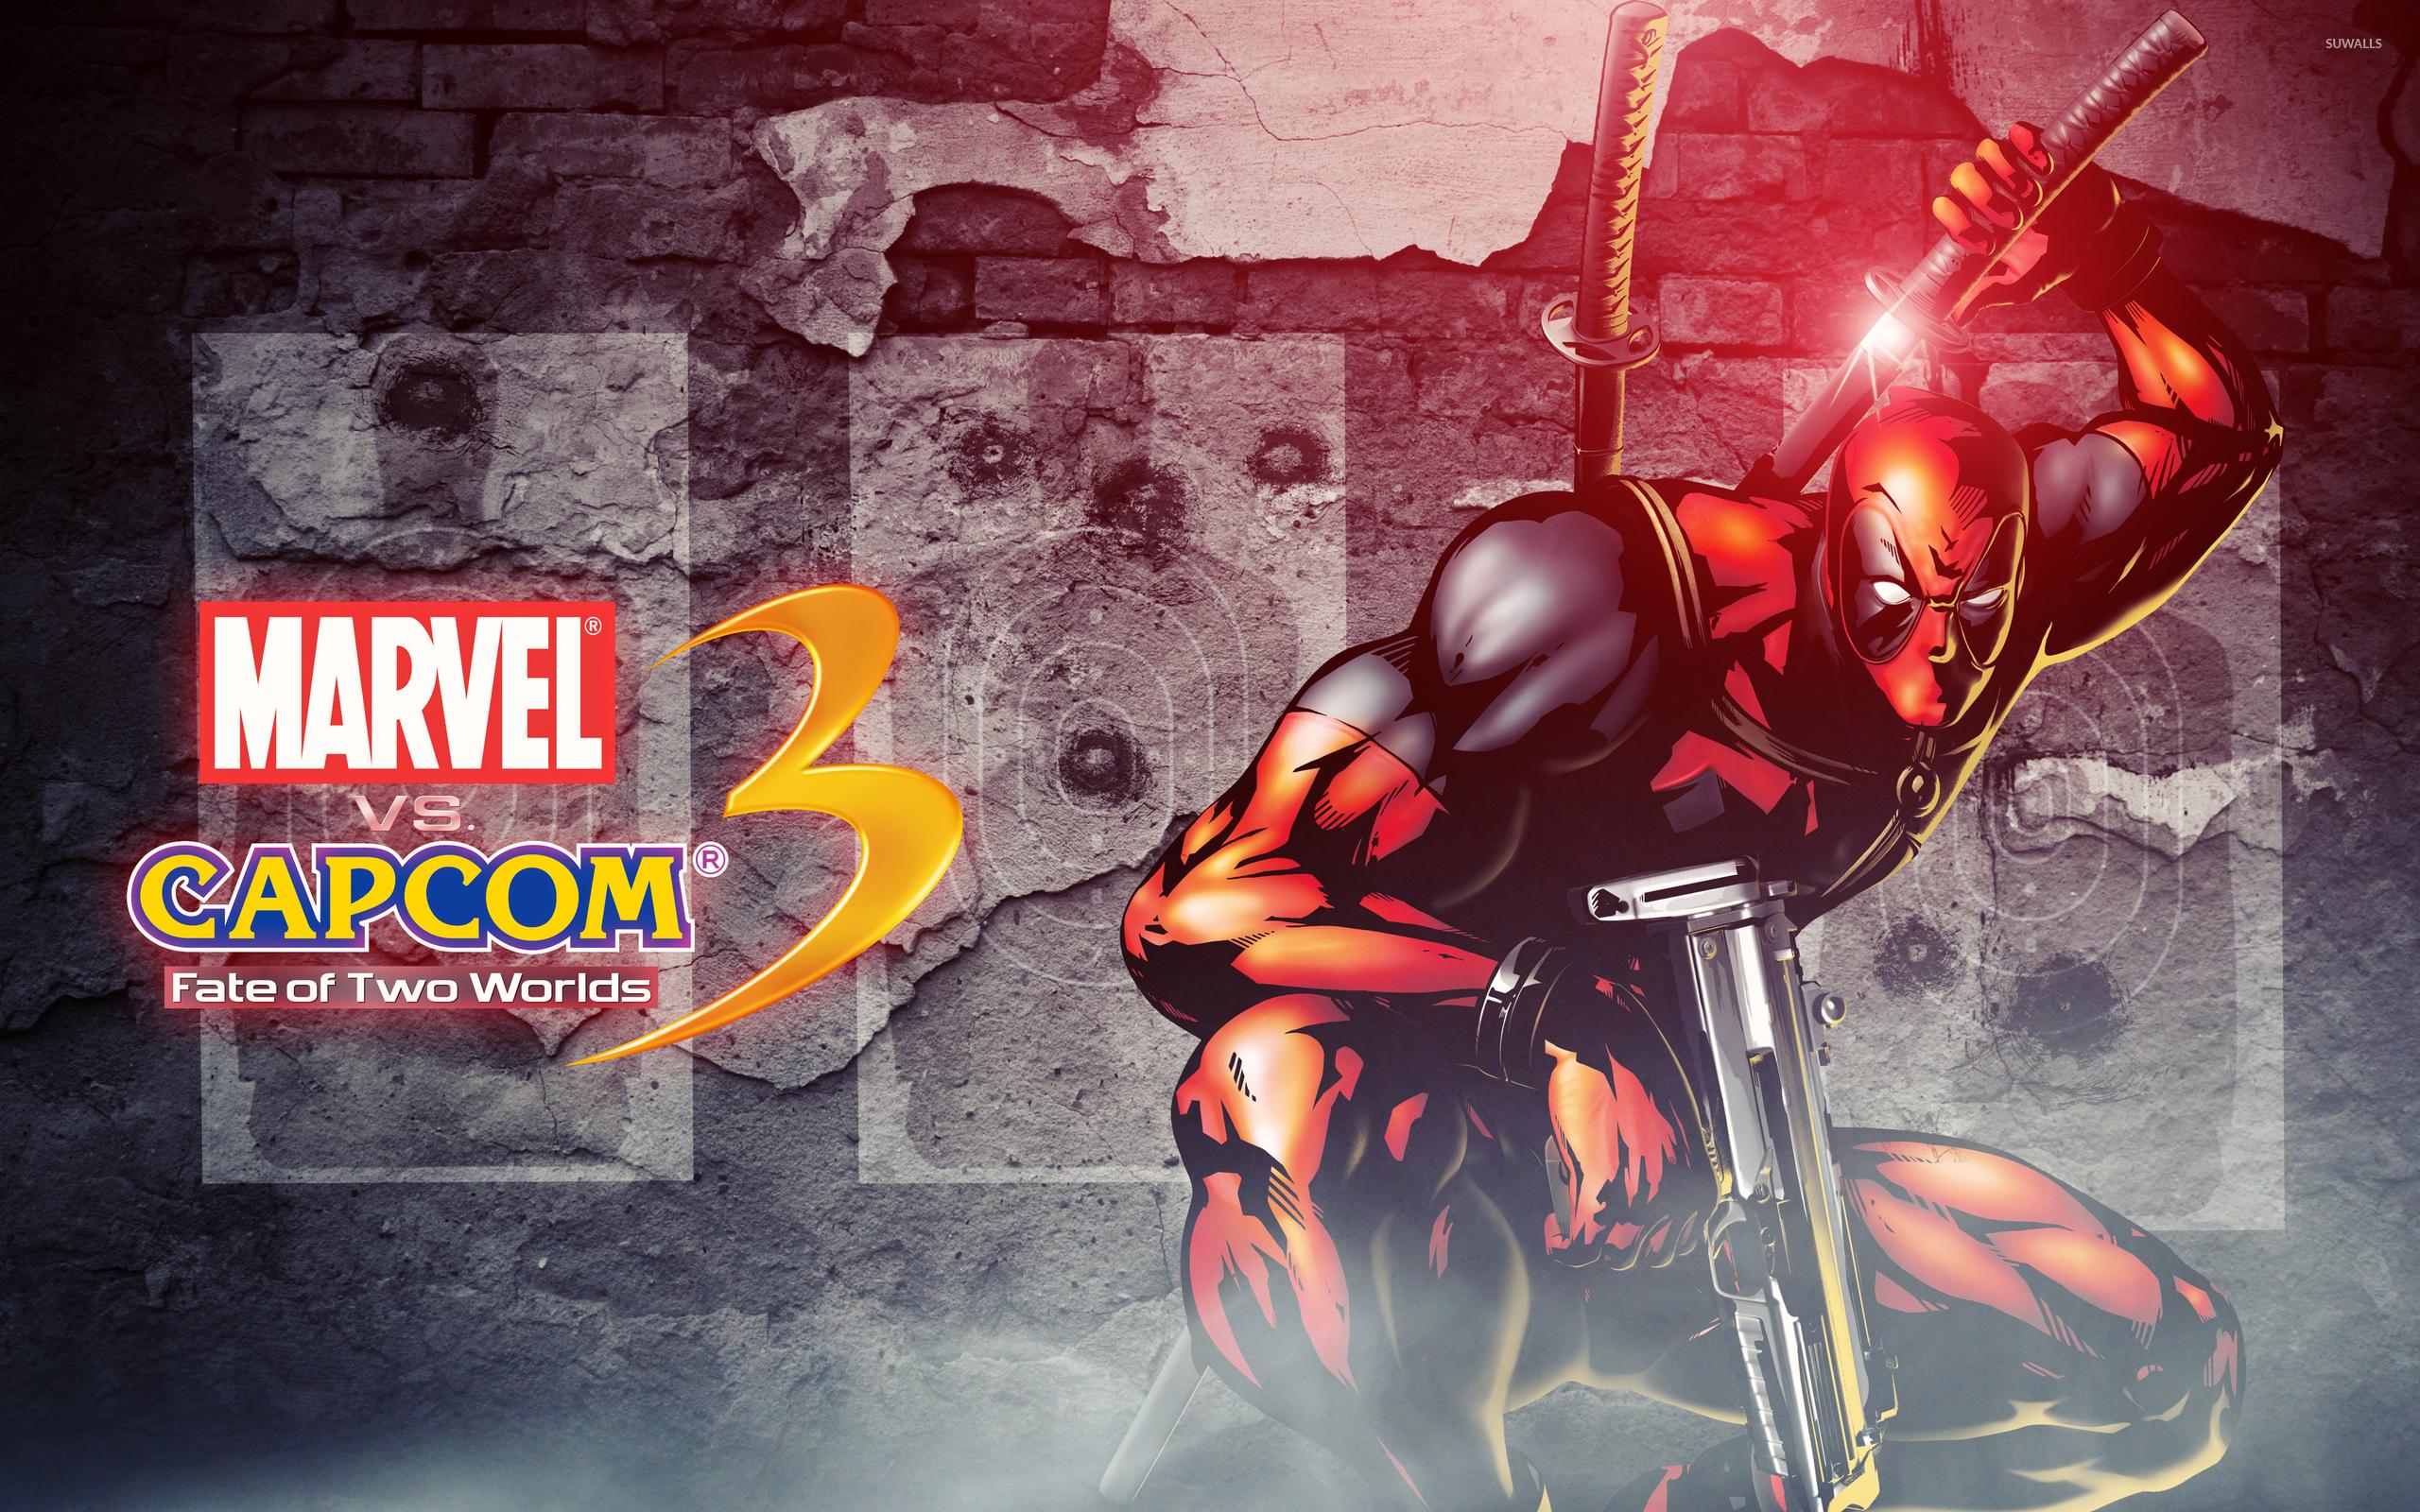 40k Quotes Wallpapers Marvel Vs Capcom Deadpool Wallpaper Game Wallpapers 2441